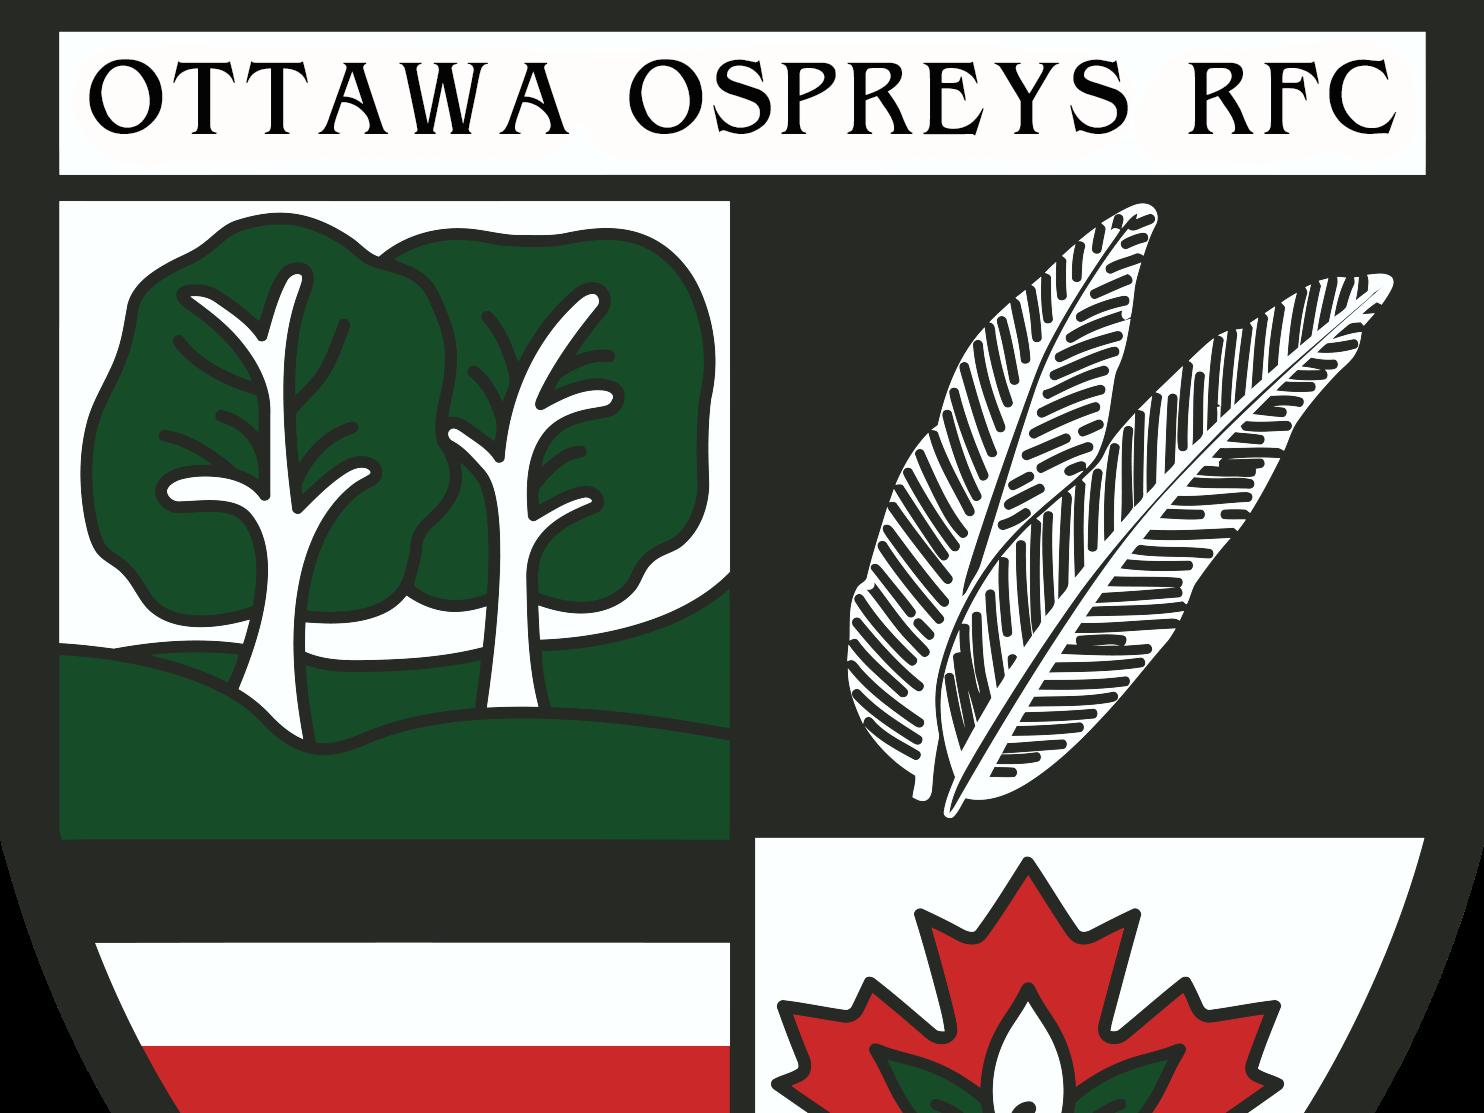 Ottawa Ospreys RFC